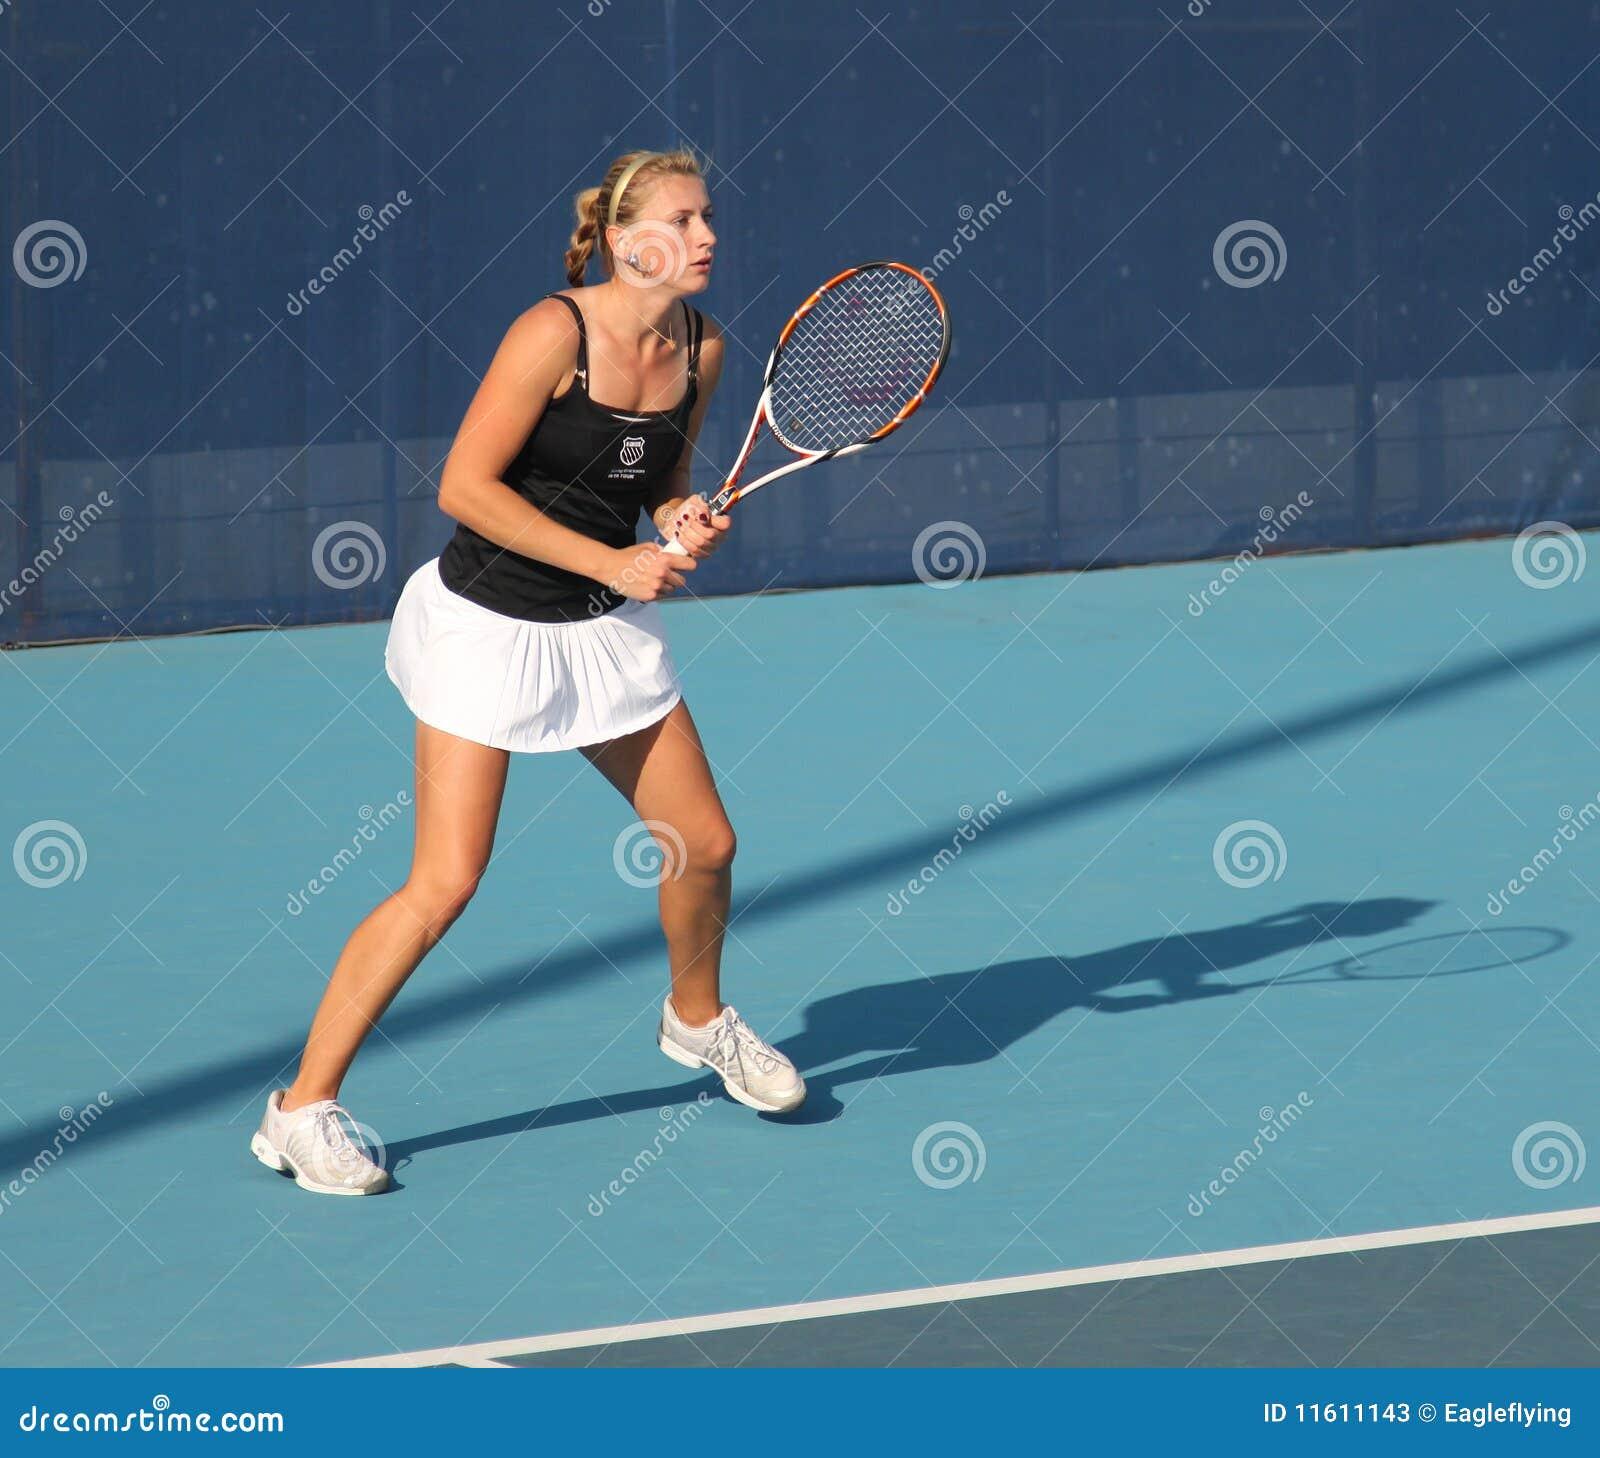 Olga Govortsova (BLR), jogador de ténis profissional